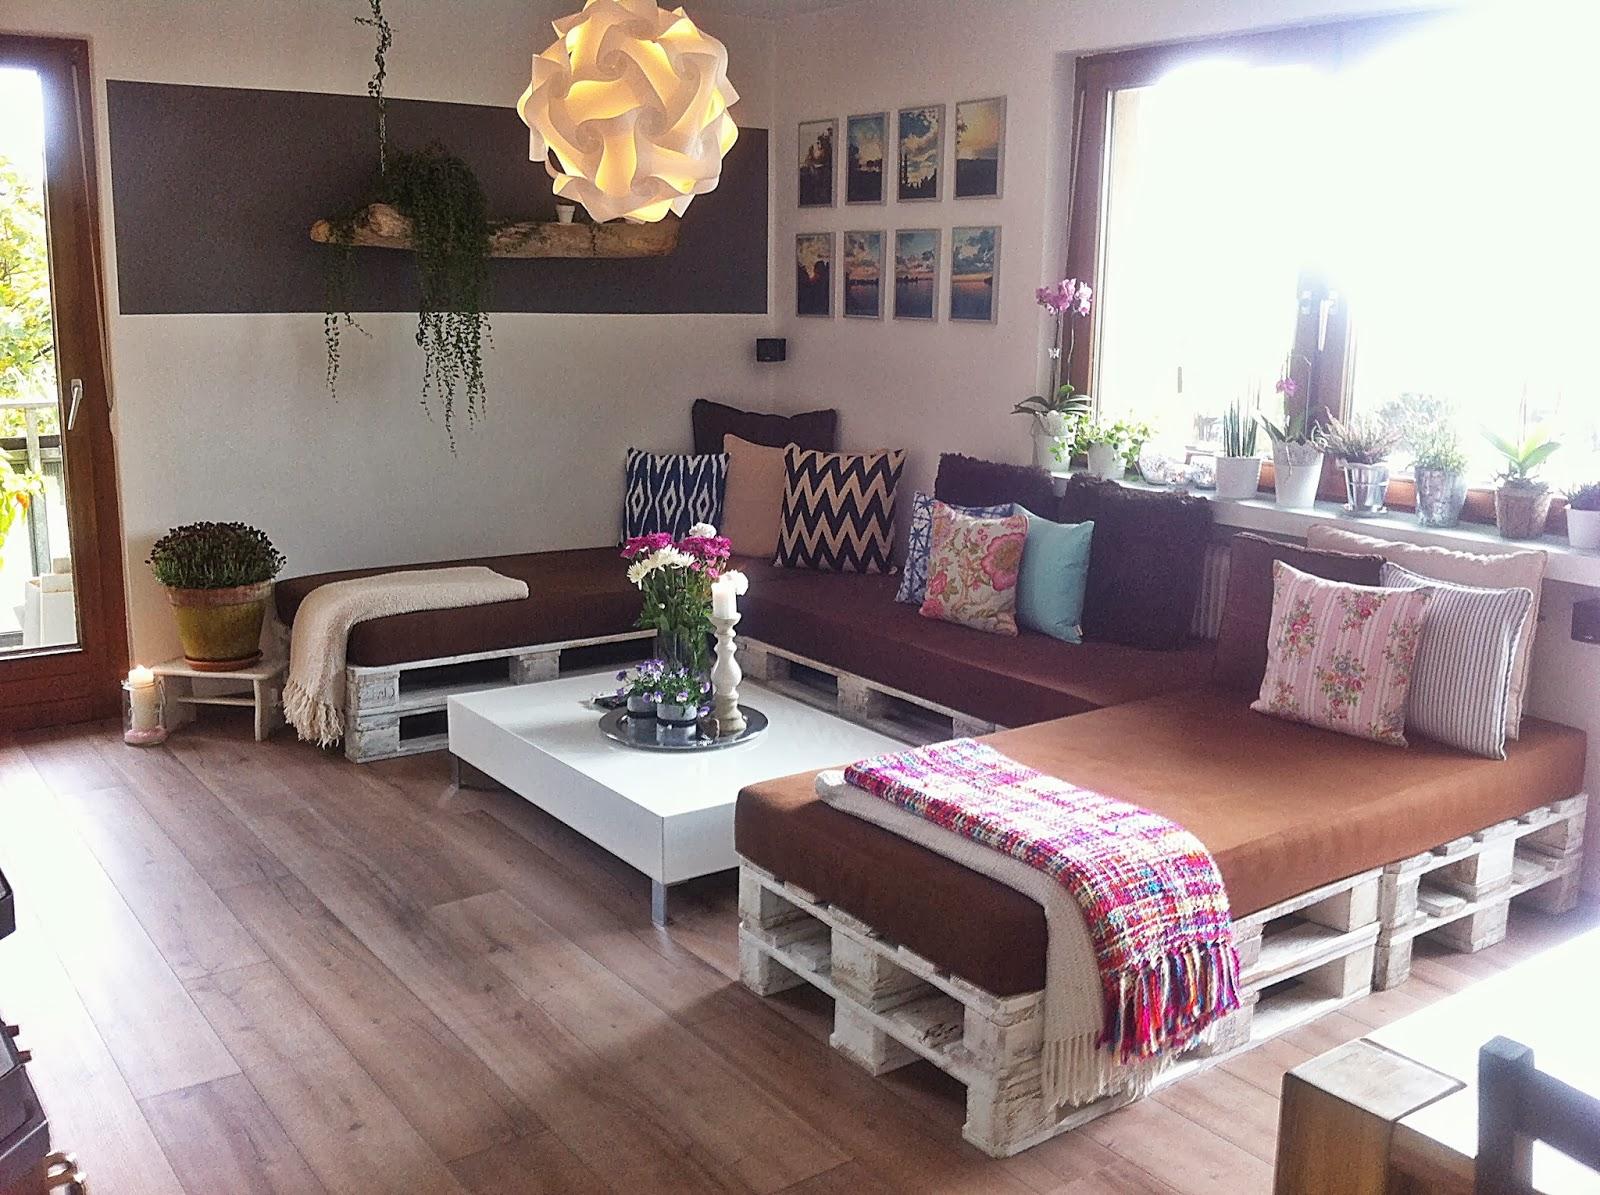 s 39 bastelkistle roomtour wohnzimmer. Black Bedroom Furniture Sets. Home Design Ideas